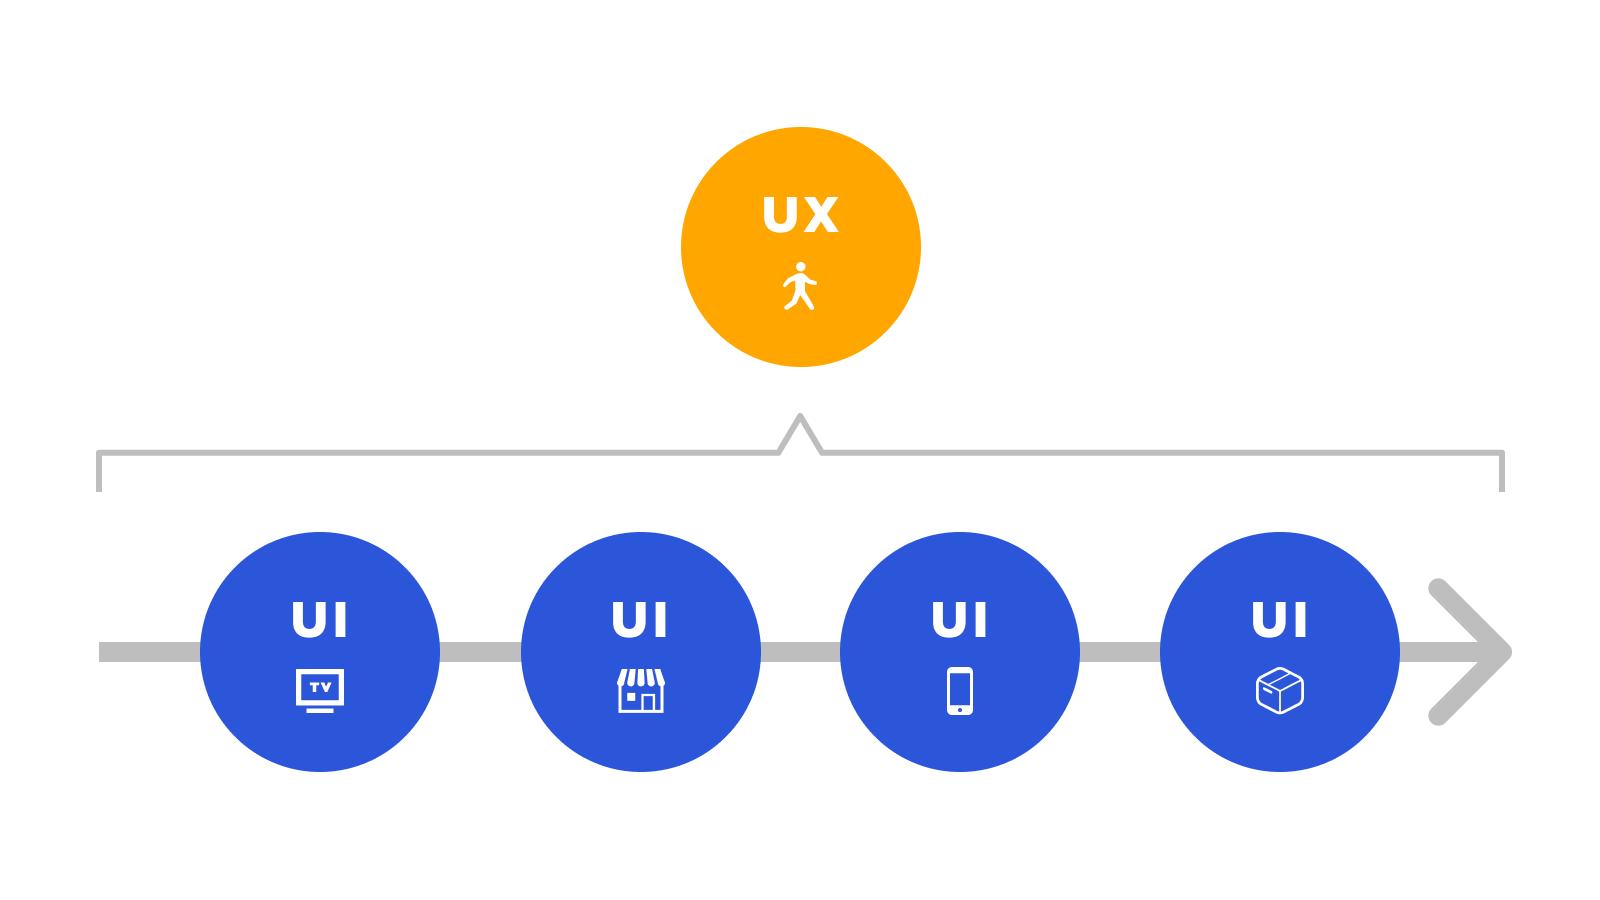 UXデザインとUIデザインの関係